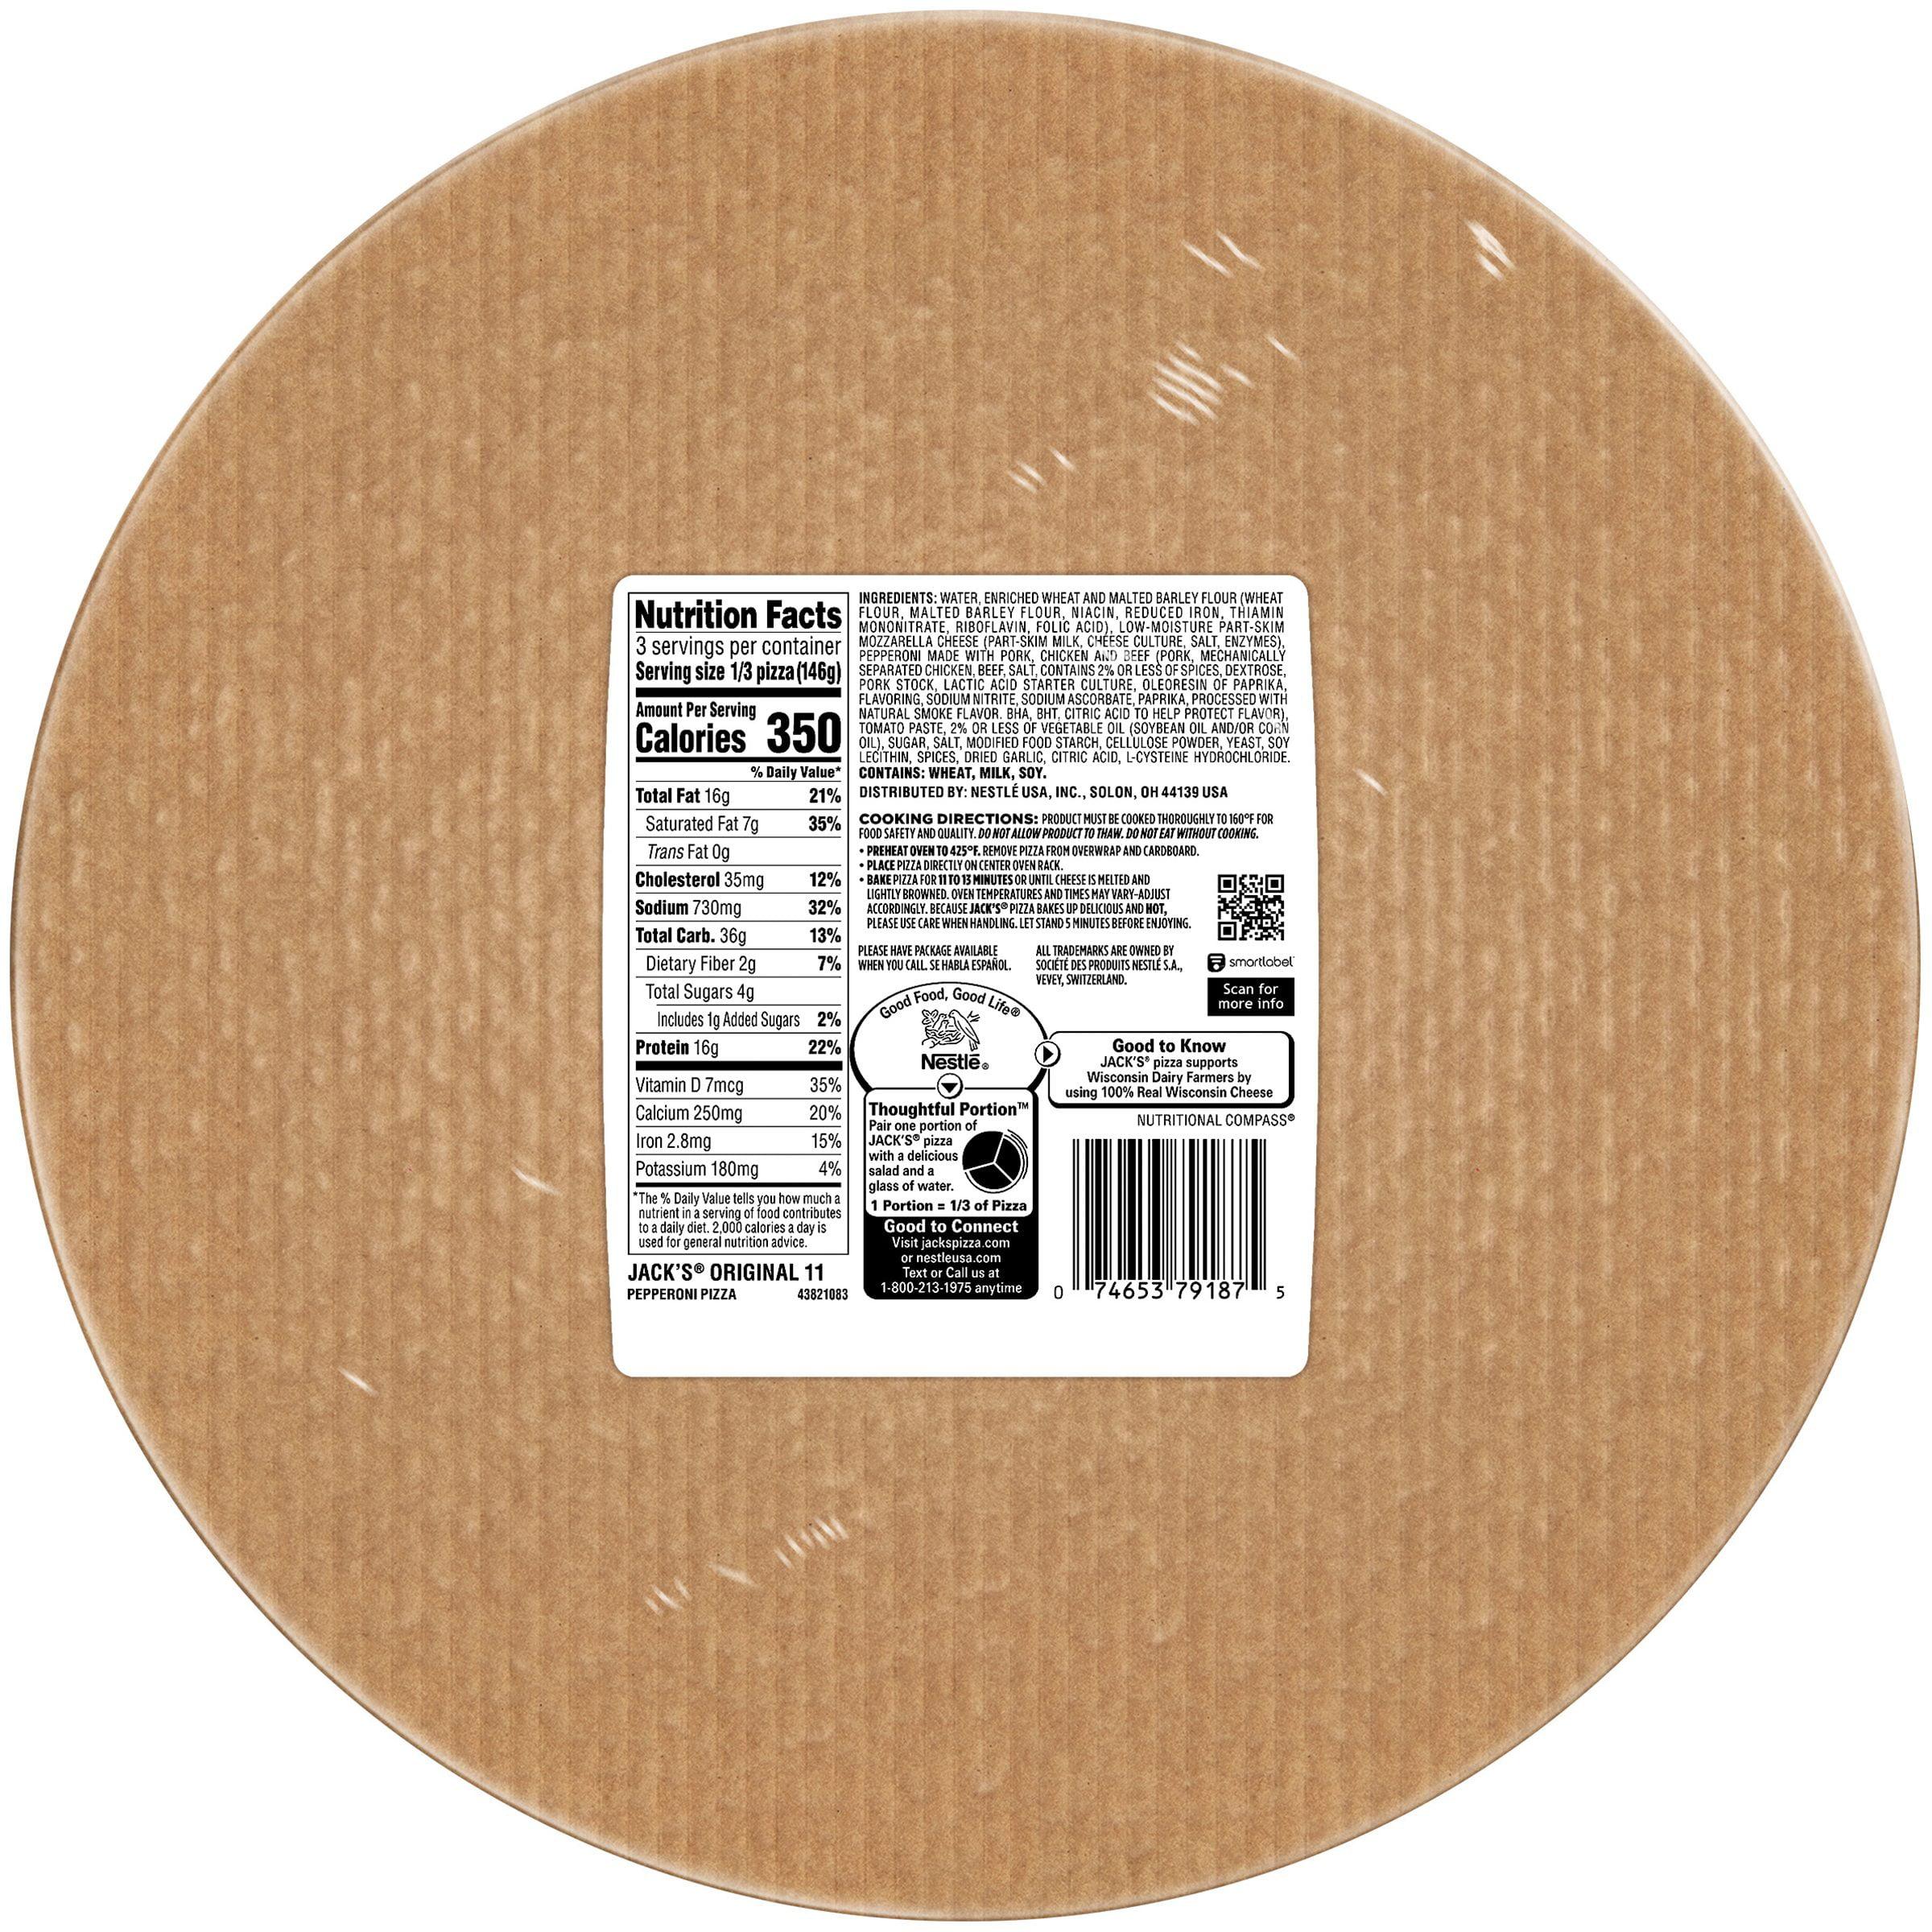 Jacks Original Thin Crust Pepperoni Pizza 154 Oz Walmartcom